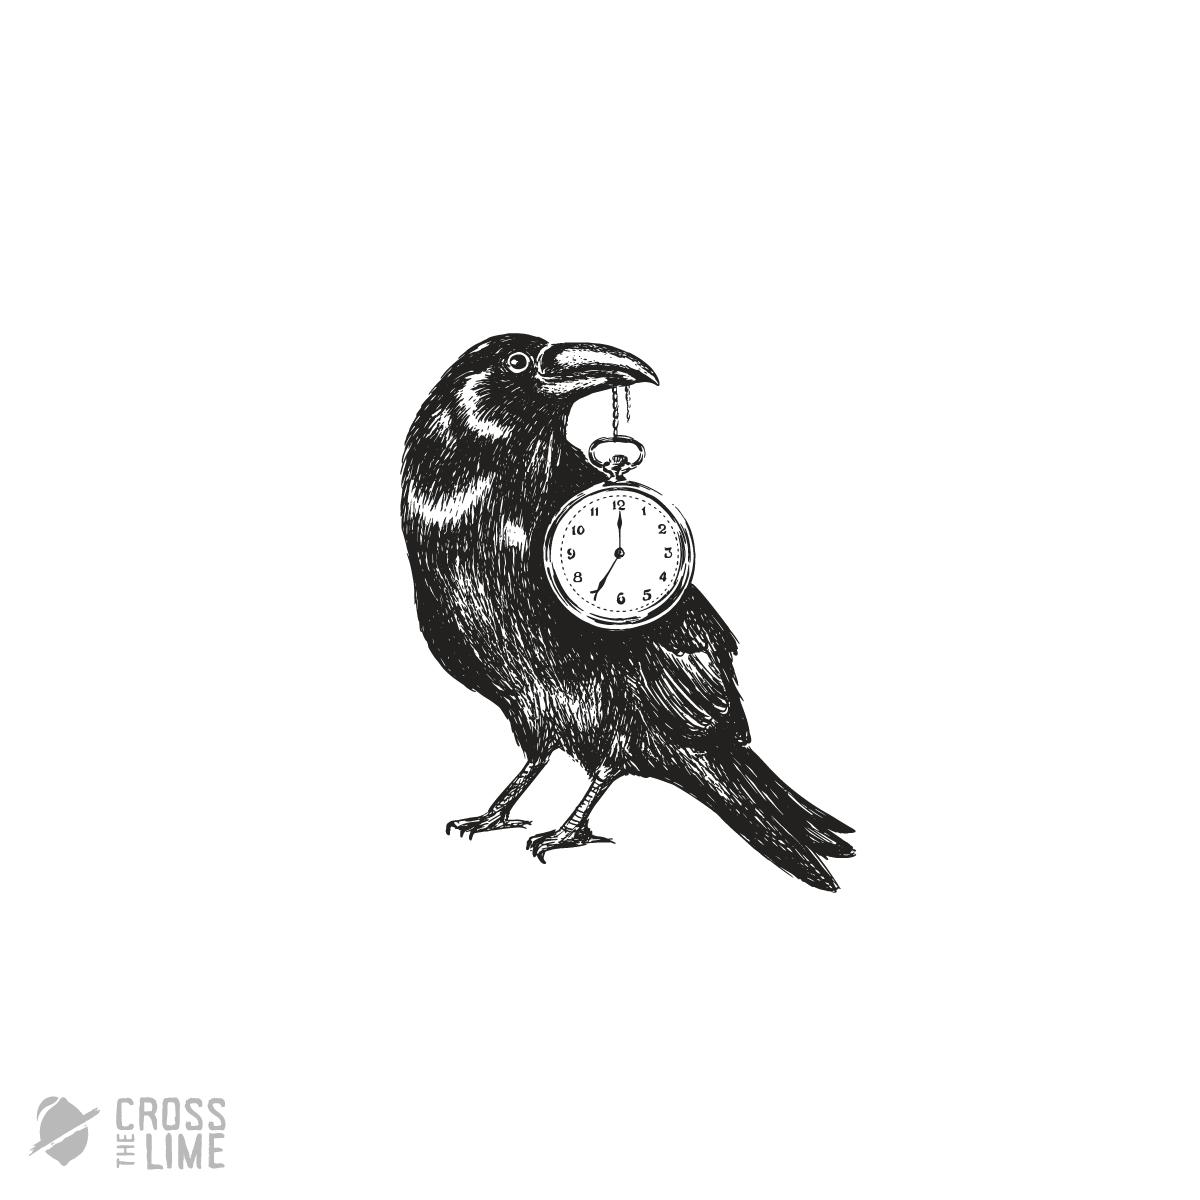 Vintage raven time logo